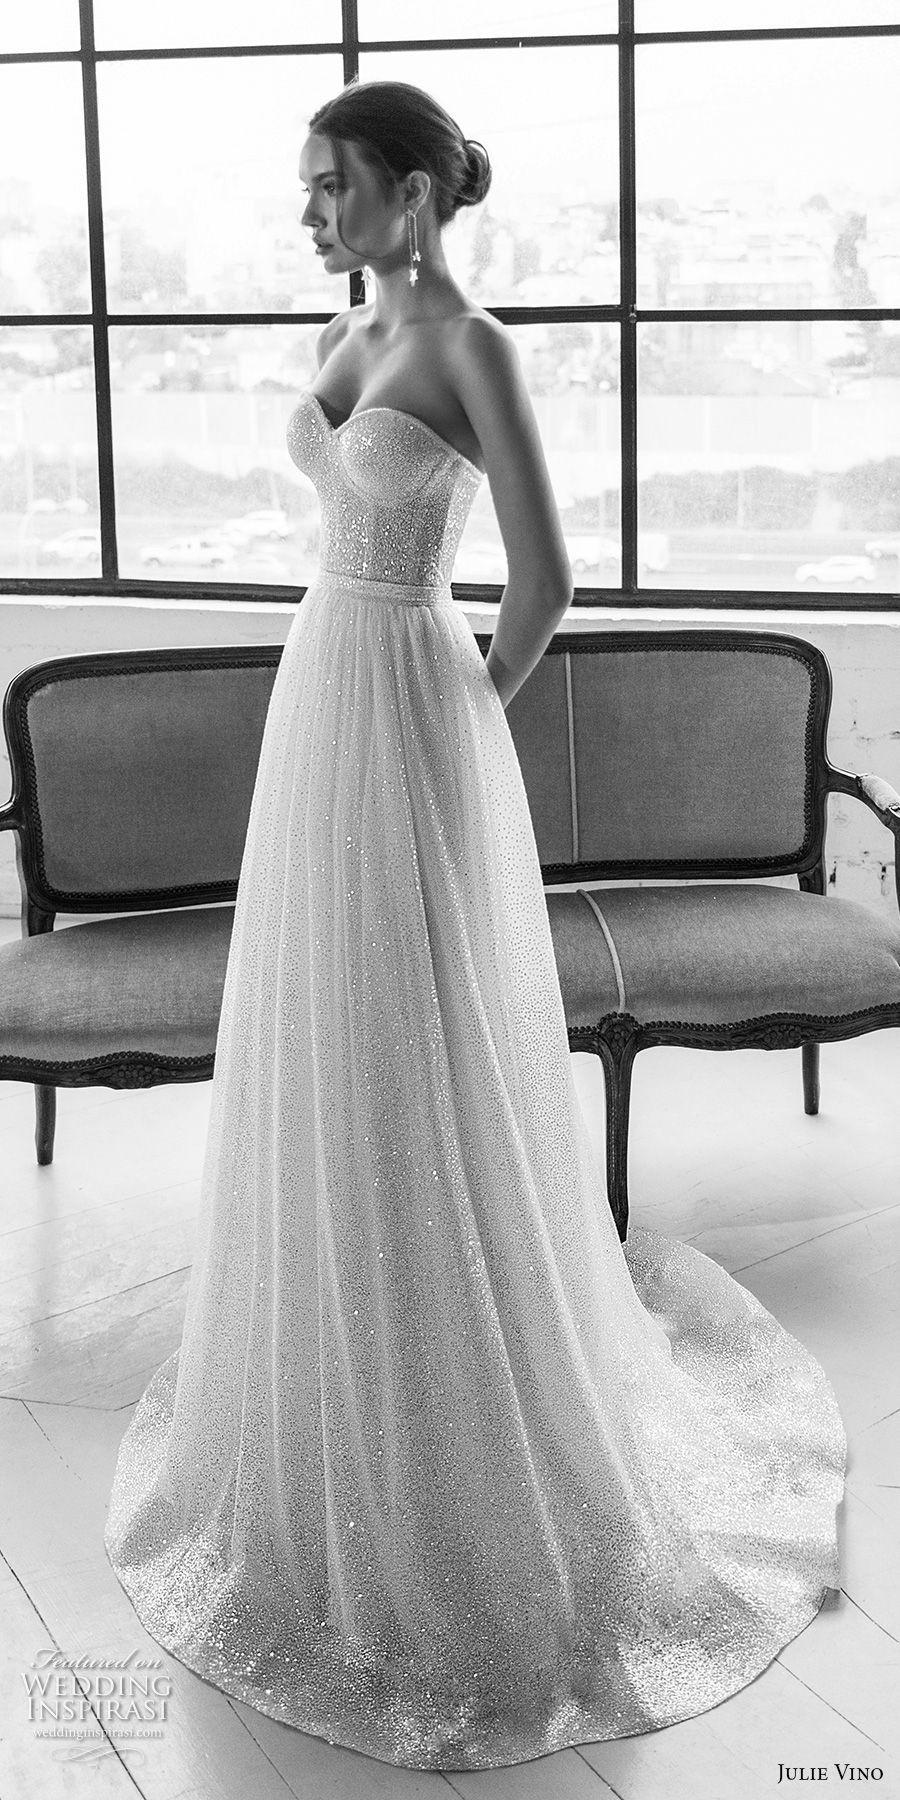 Lace over tulle wedding dress january 2019 julie vino  romanzo braut trägerlos Schatzausschnitt volle